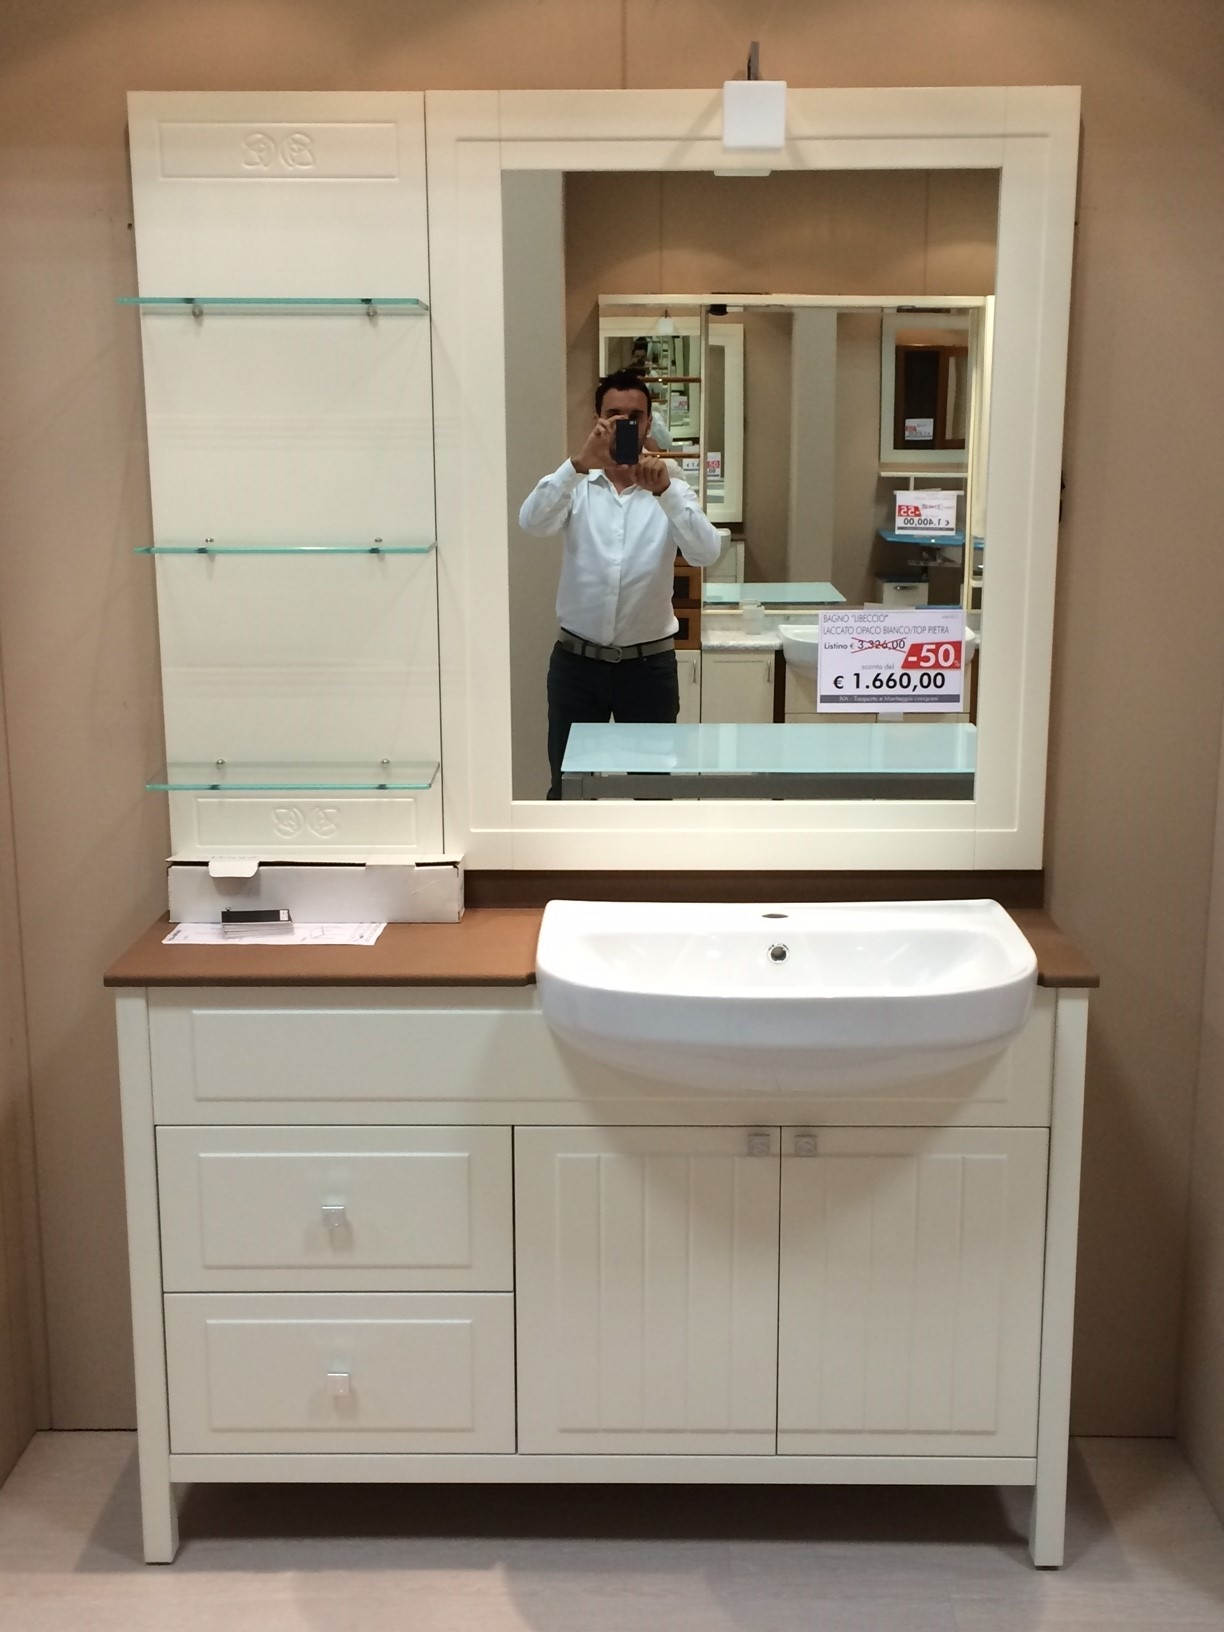 Zanotto bagni outlet moderno laccato opaco arredo bagno for Arredo mobili outlet